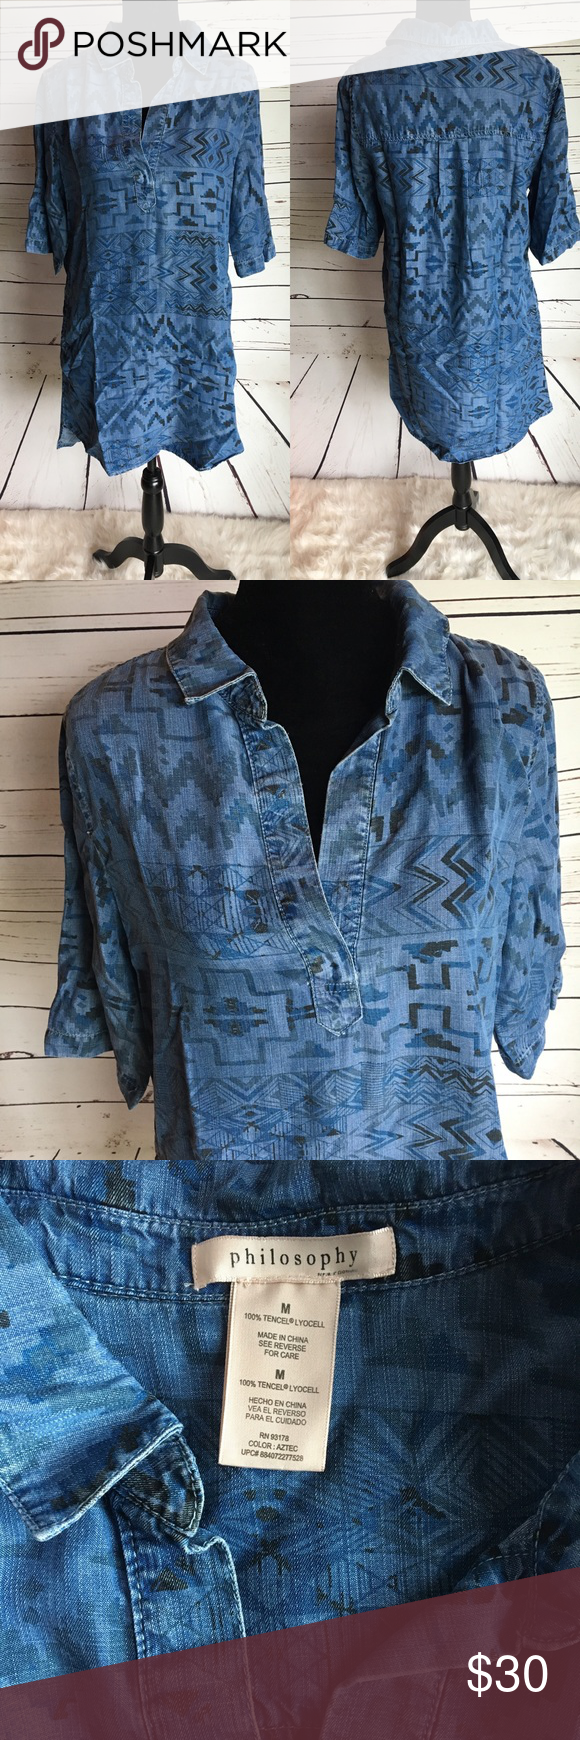 d4a4861f3e5 Philosophy chambray denim shirt dress Aztec tunic Philosophy denim chambray shirt  dress style tunic. Aztec